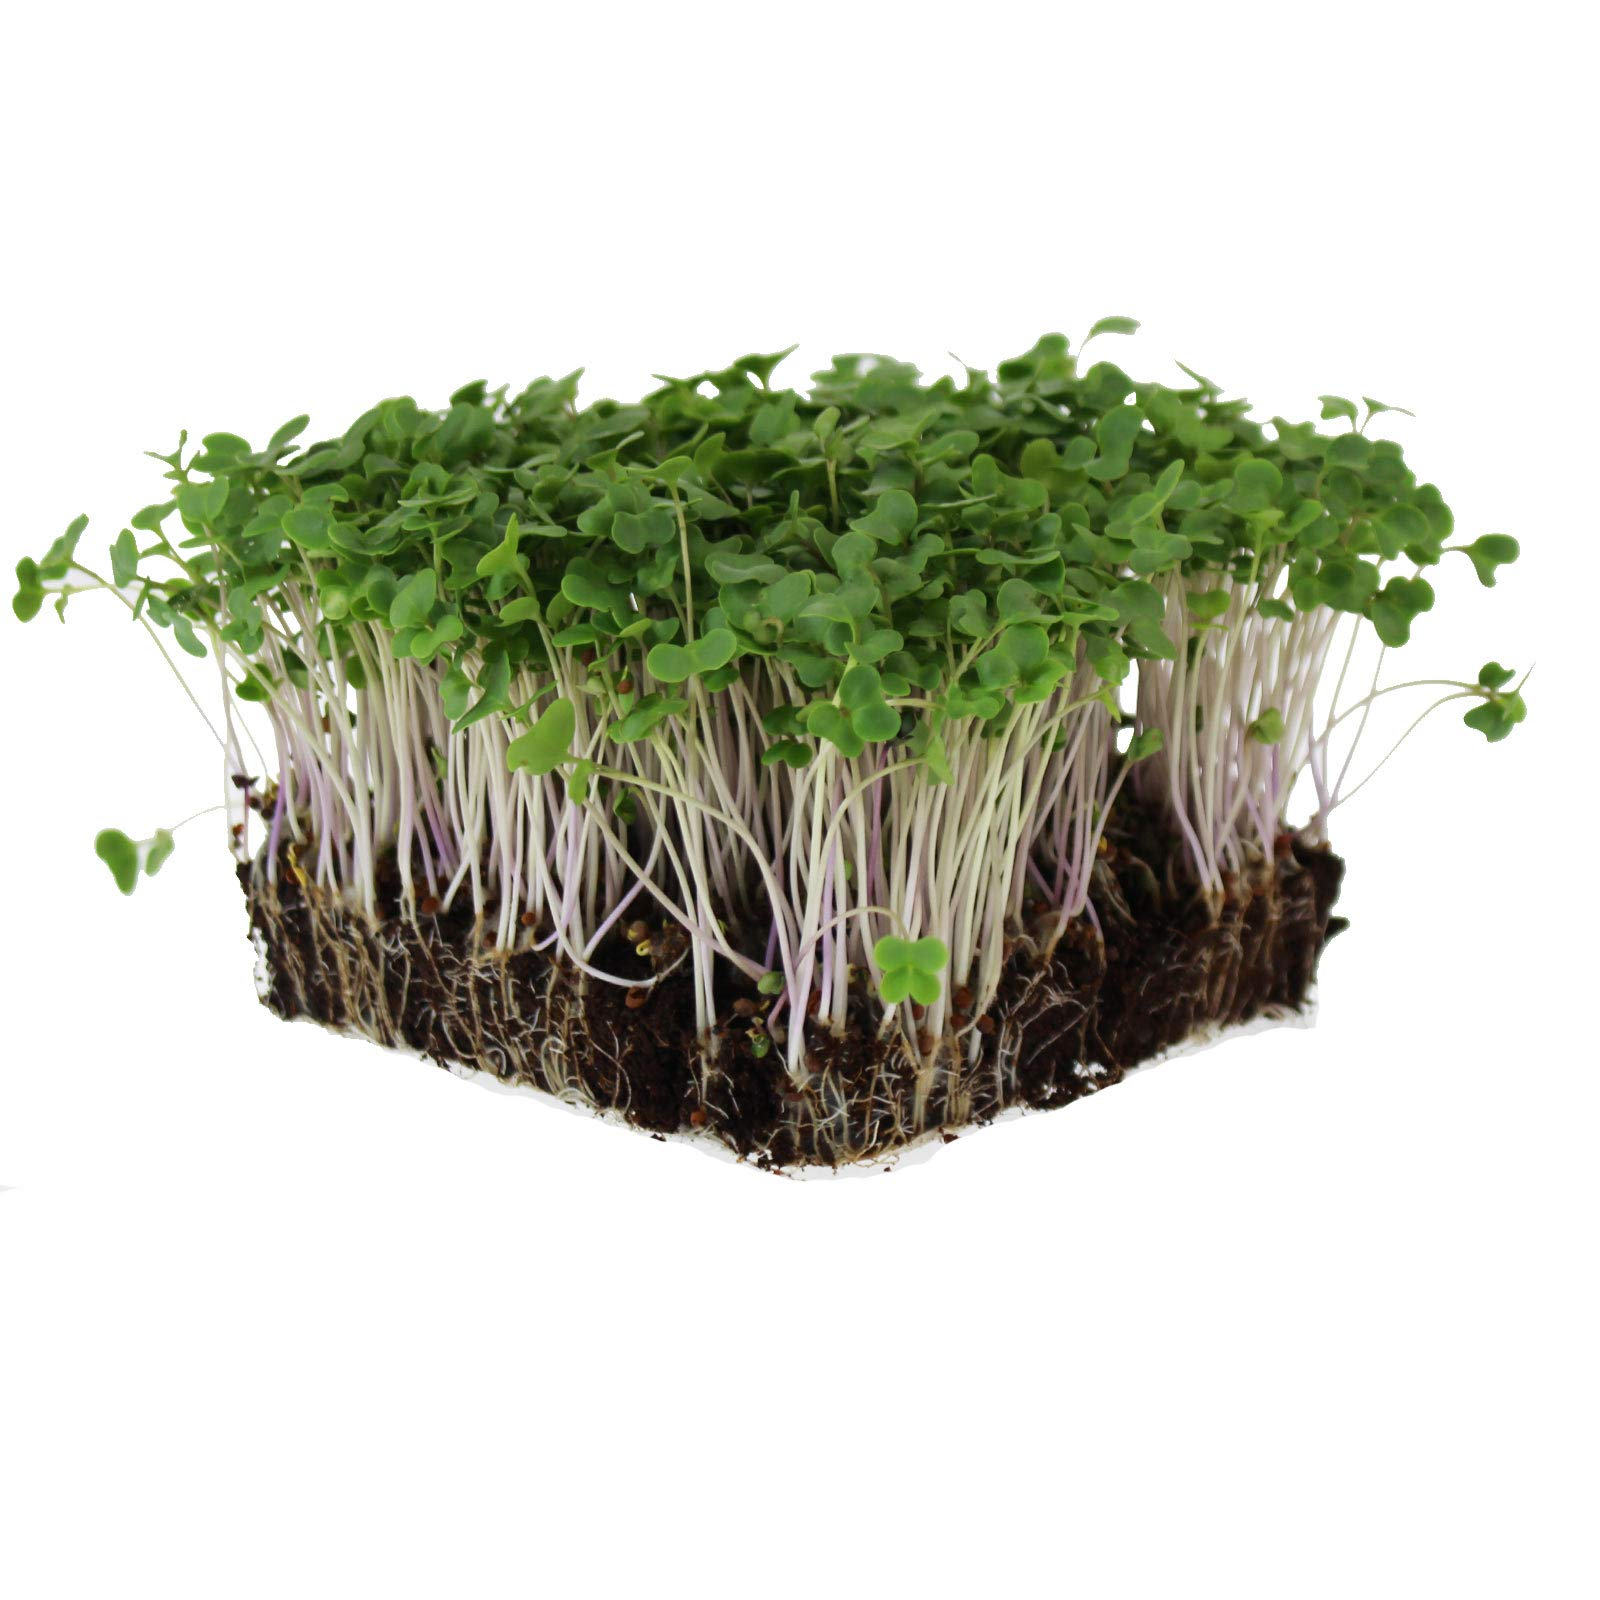 Mountain Valley Seed Company Waltham 29 Broccoli Seeds | Non-GMO Bulk Heirloom Broccoli Seeds for Sprouting, Microgreens, Vegetable Gardening, Garden Salad Garnishes, More (5 Lb) by Mountain Valley Seed Company